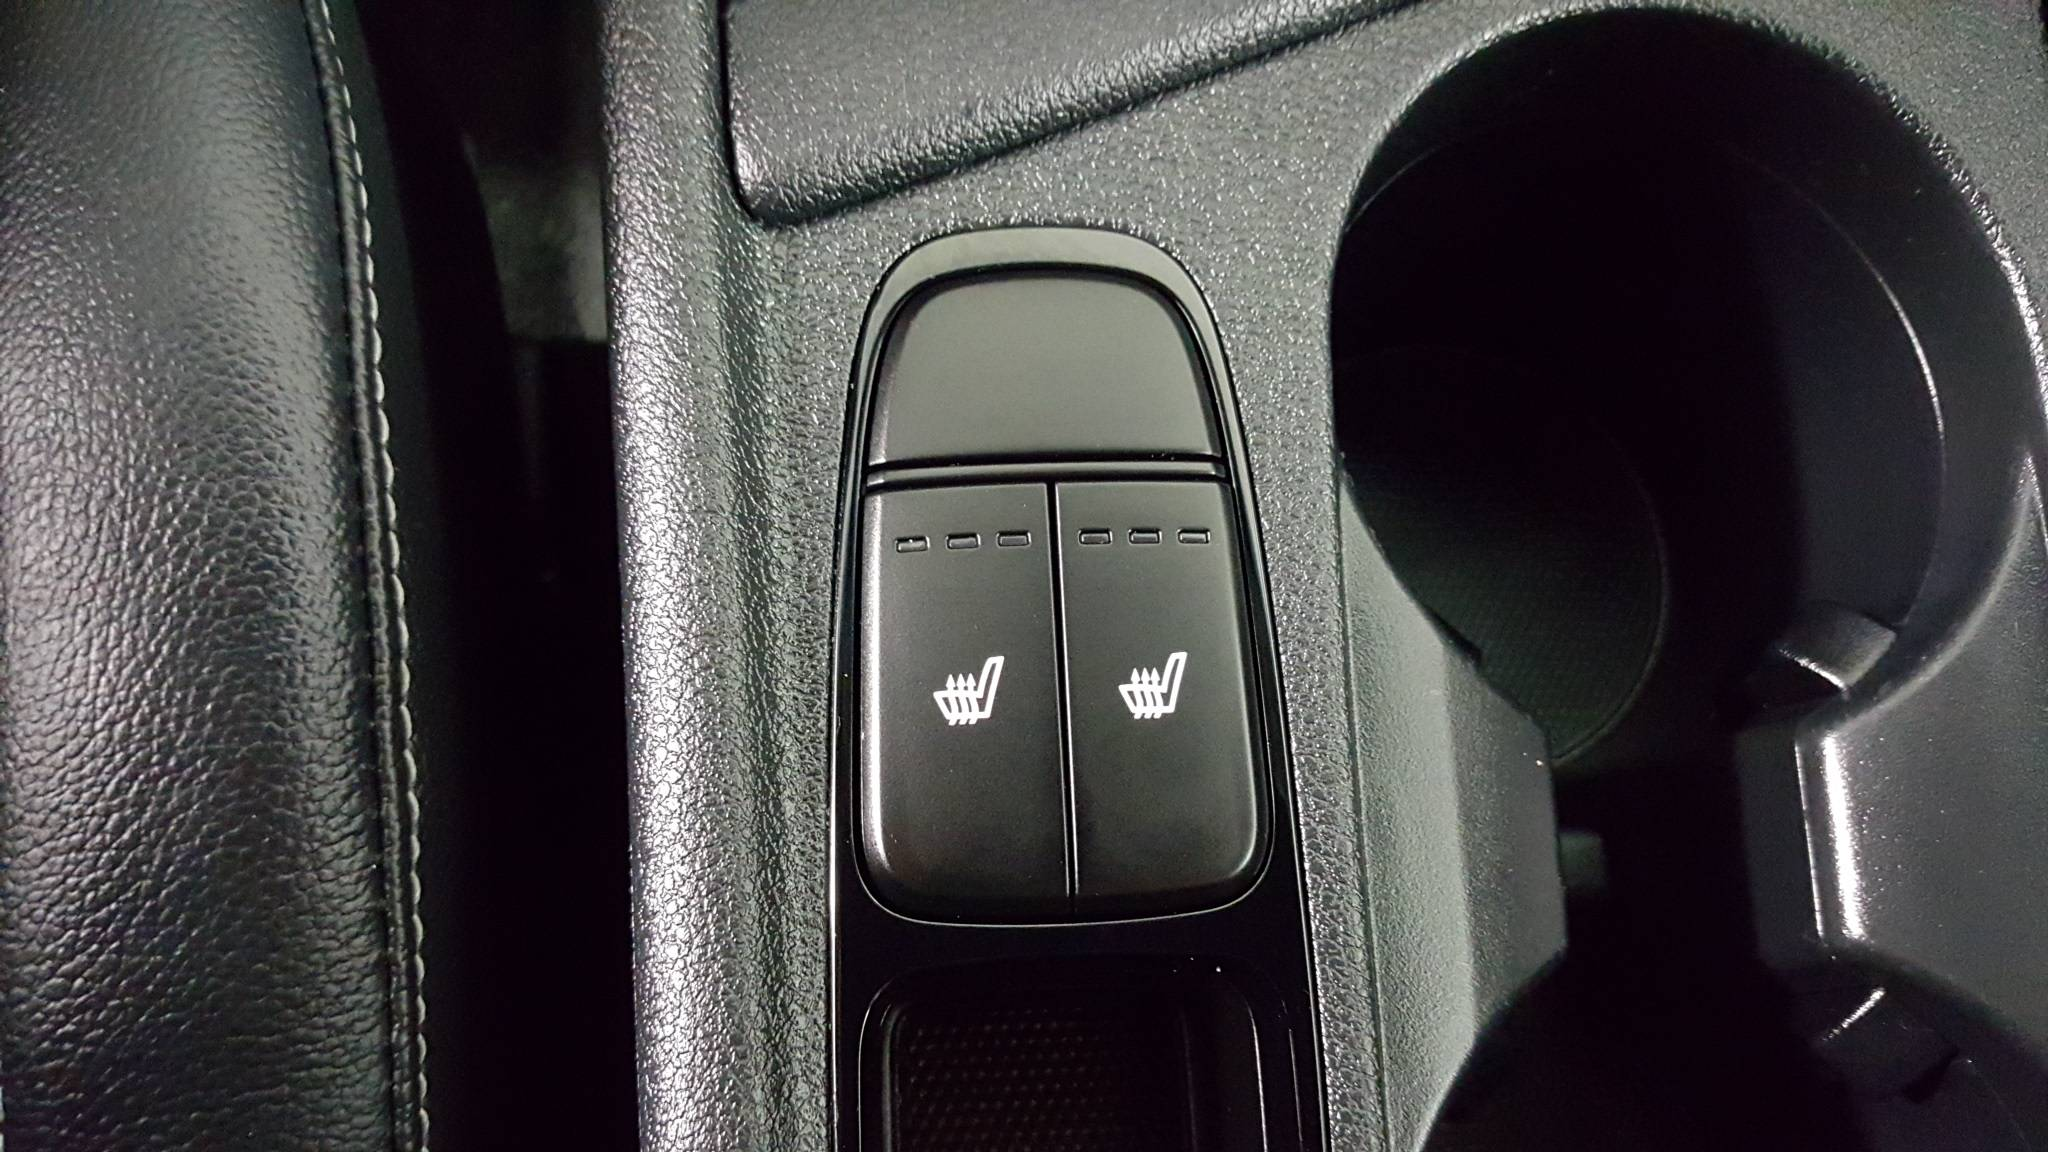 Pre-Owned 2017 Kia Niro Touring Launch Edition